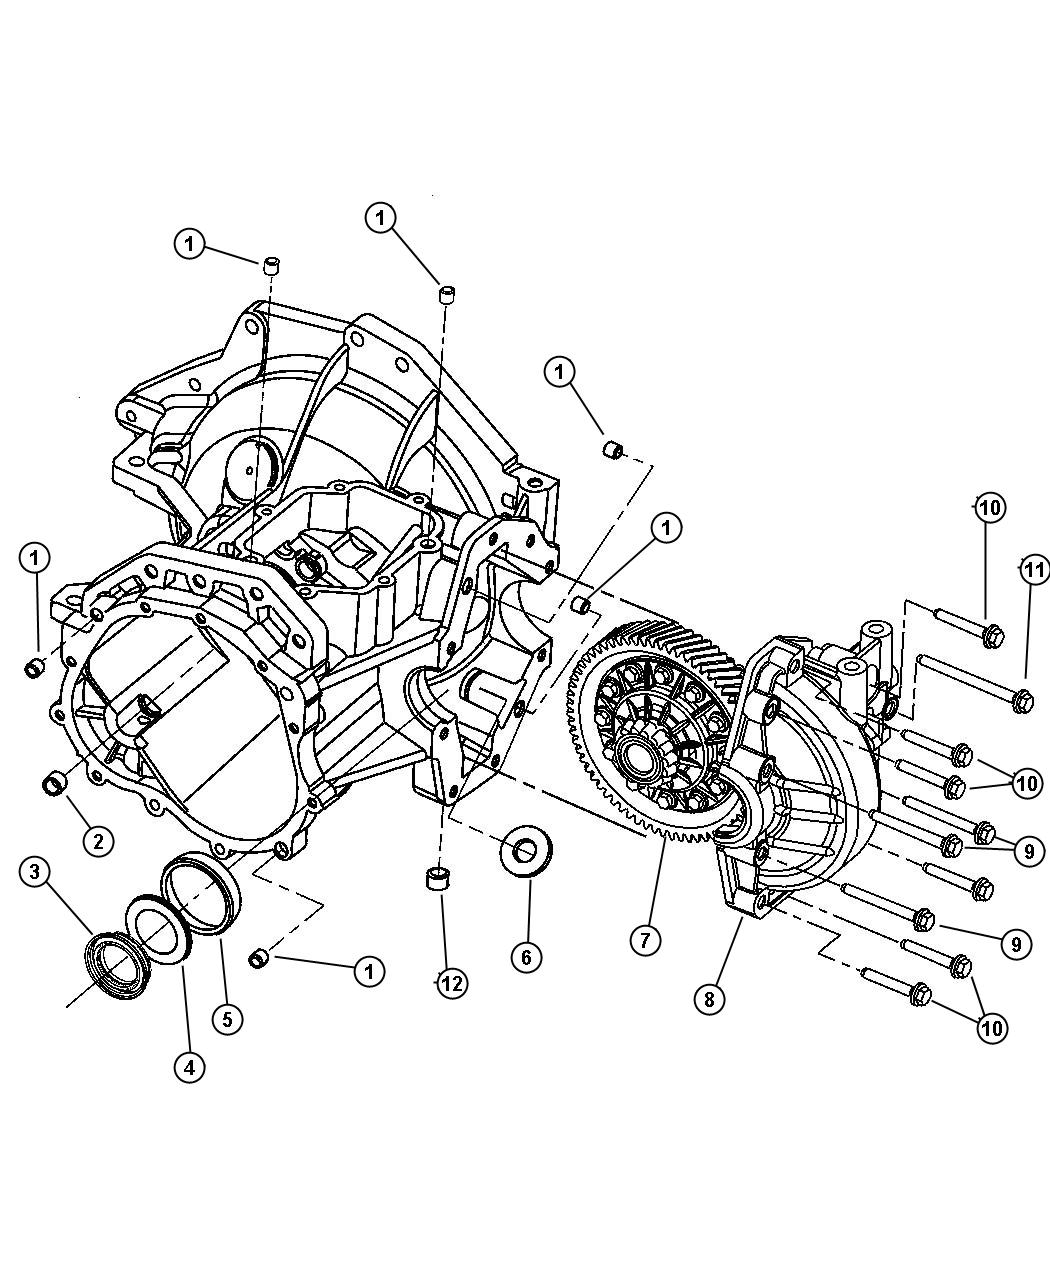 Dodge Neon Seal Axle Drive Shaft